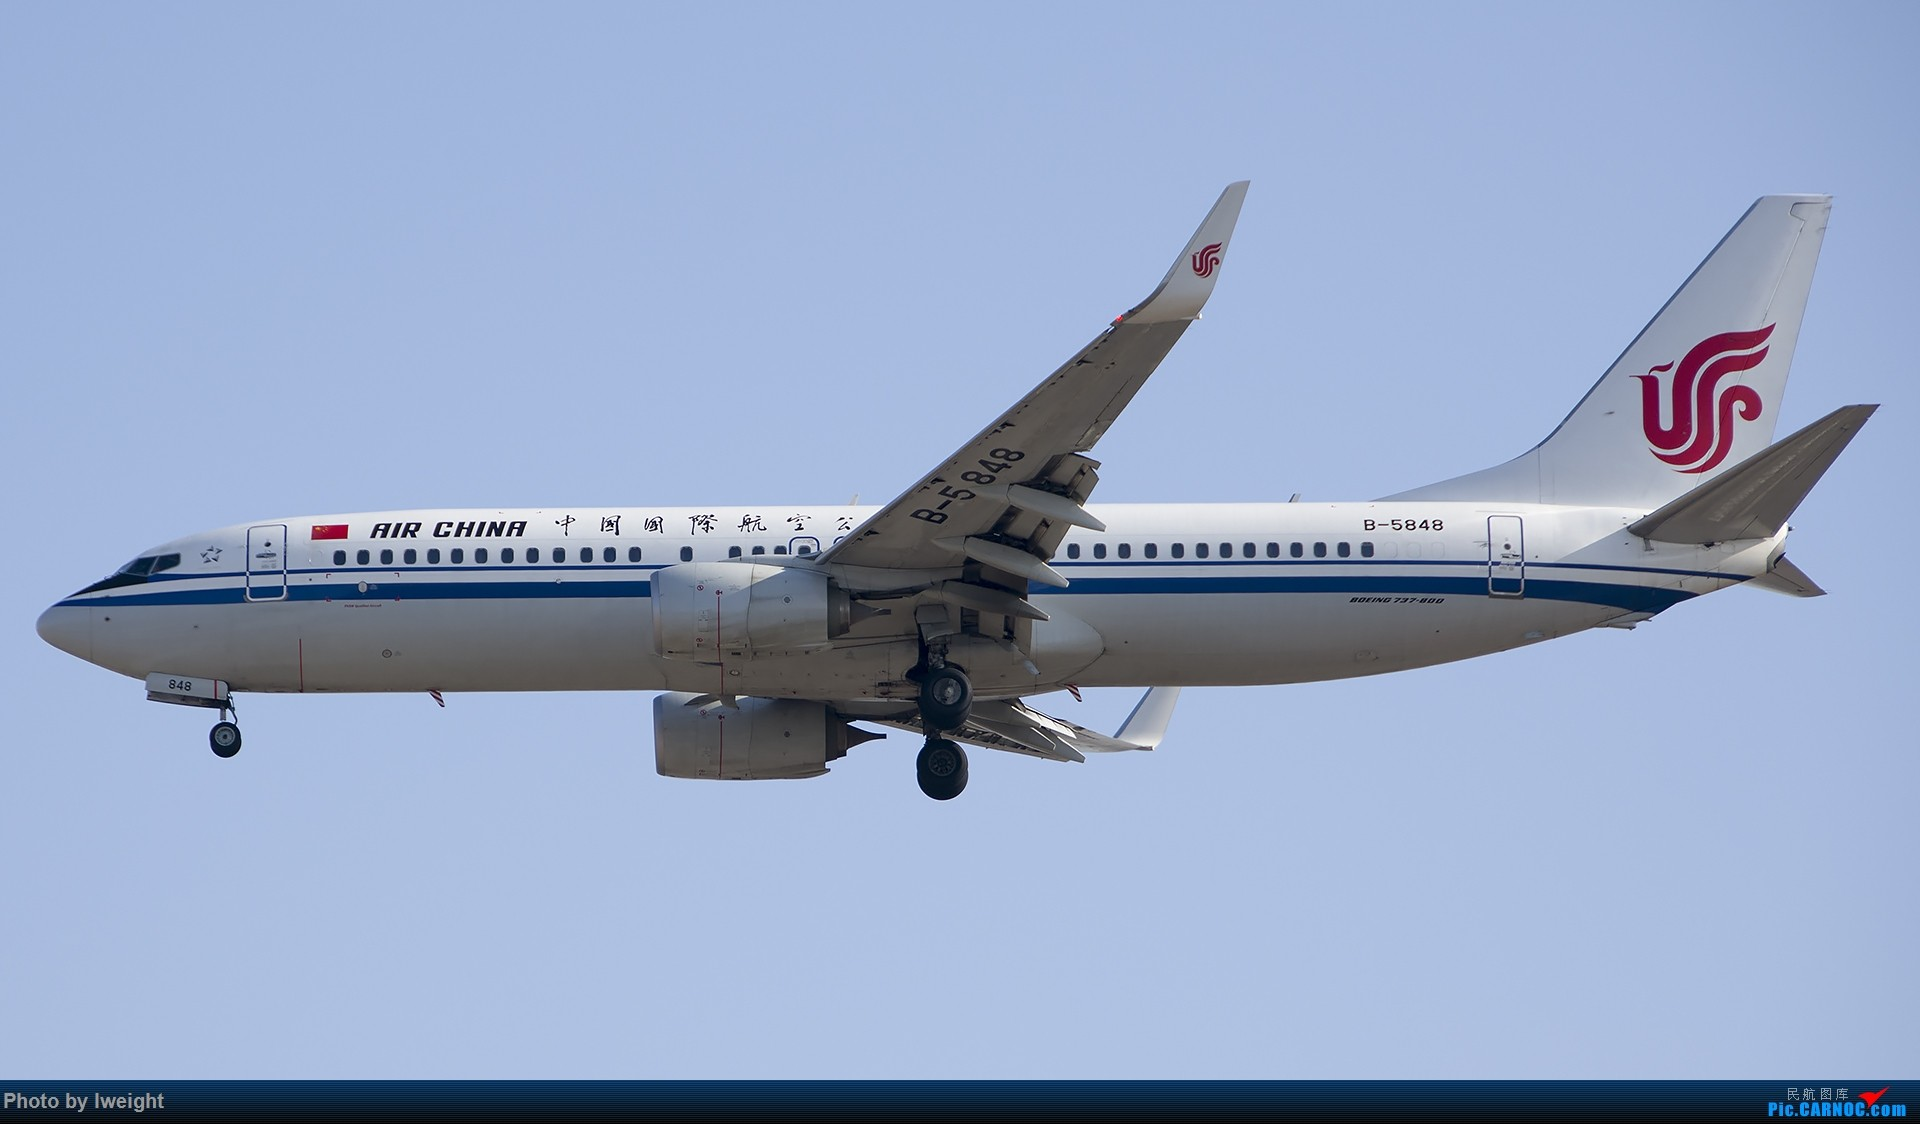 Re:[原创]庆祝升级777,发上今天在首都机场拍的所有飞机【2014-12-14】 BOEING 737-800 B-5848 中国北京首都国际机场